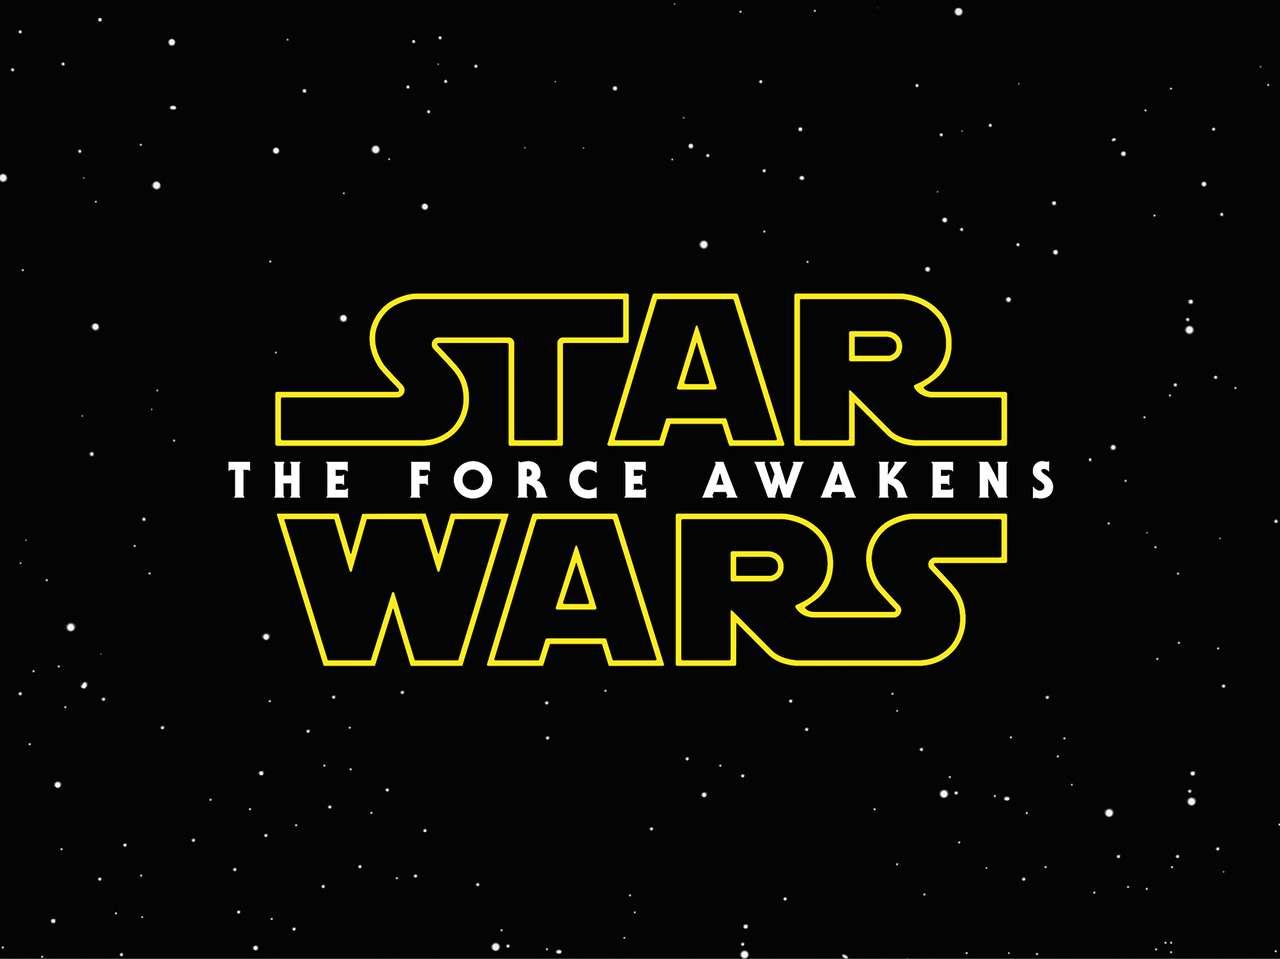 'Star Wars: The Force Awakens' se estrenará el 18 de diciembre de 2015. Foto: Lucasfilm